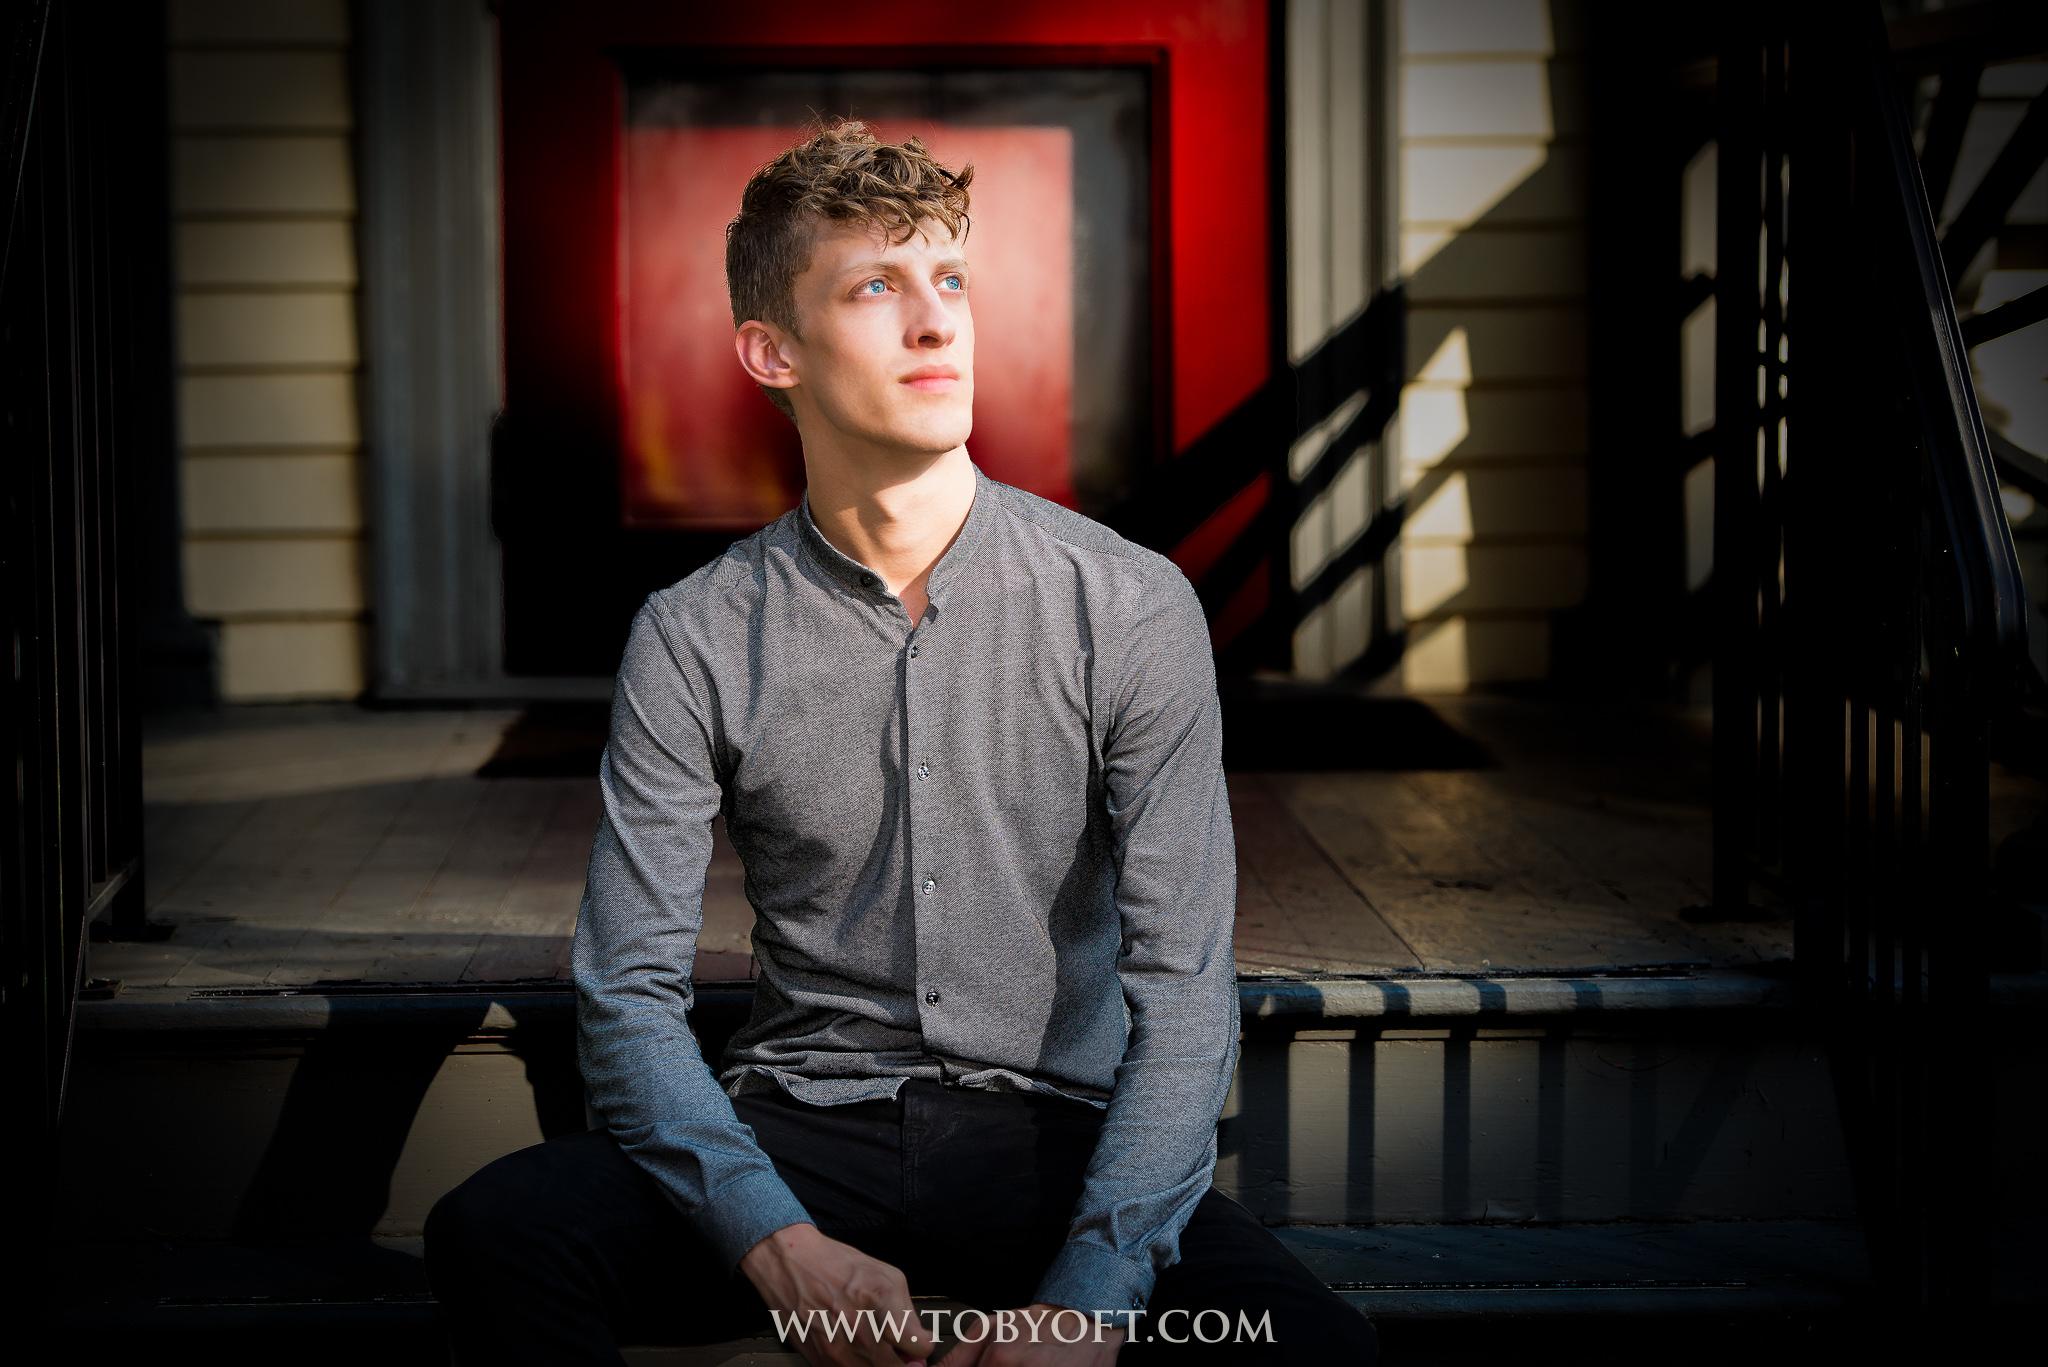 Chris Sokolowski  - Headshot at Tanglewood